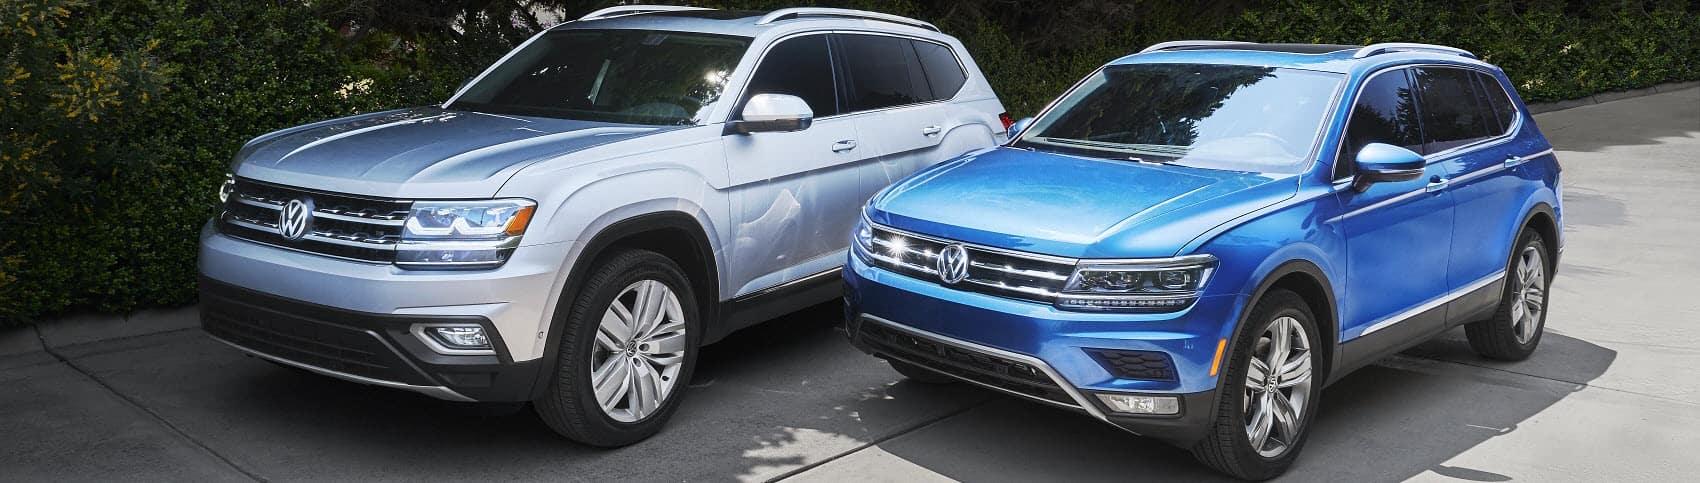 Volkswagen Vehicles for sale near Panama City FL